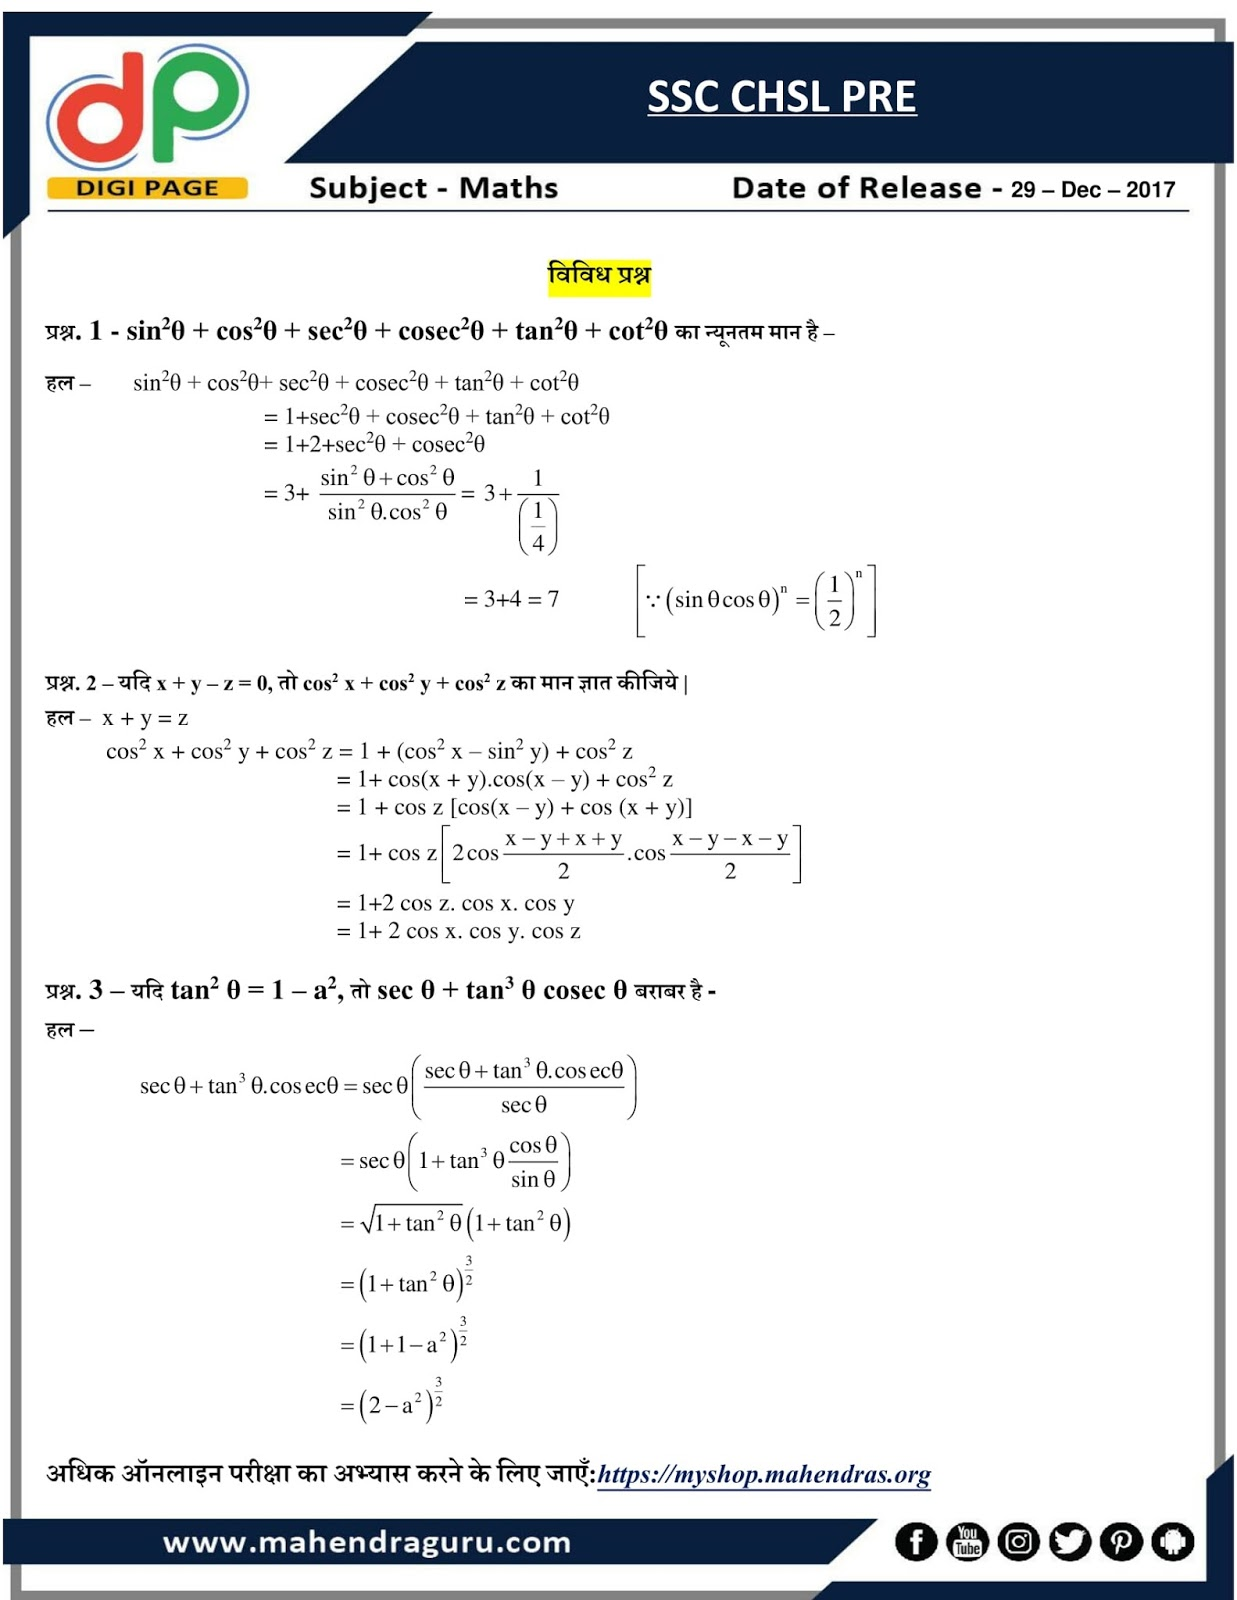 DP   Trigonometry Questions For SSC CHSL Prelims   29 - 12 - 17